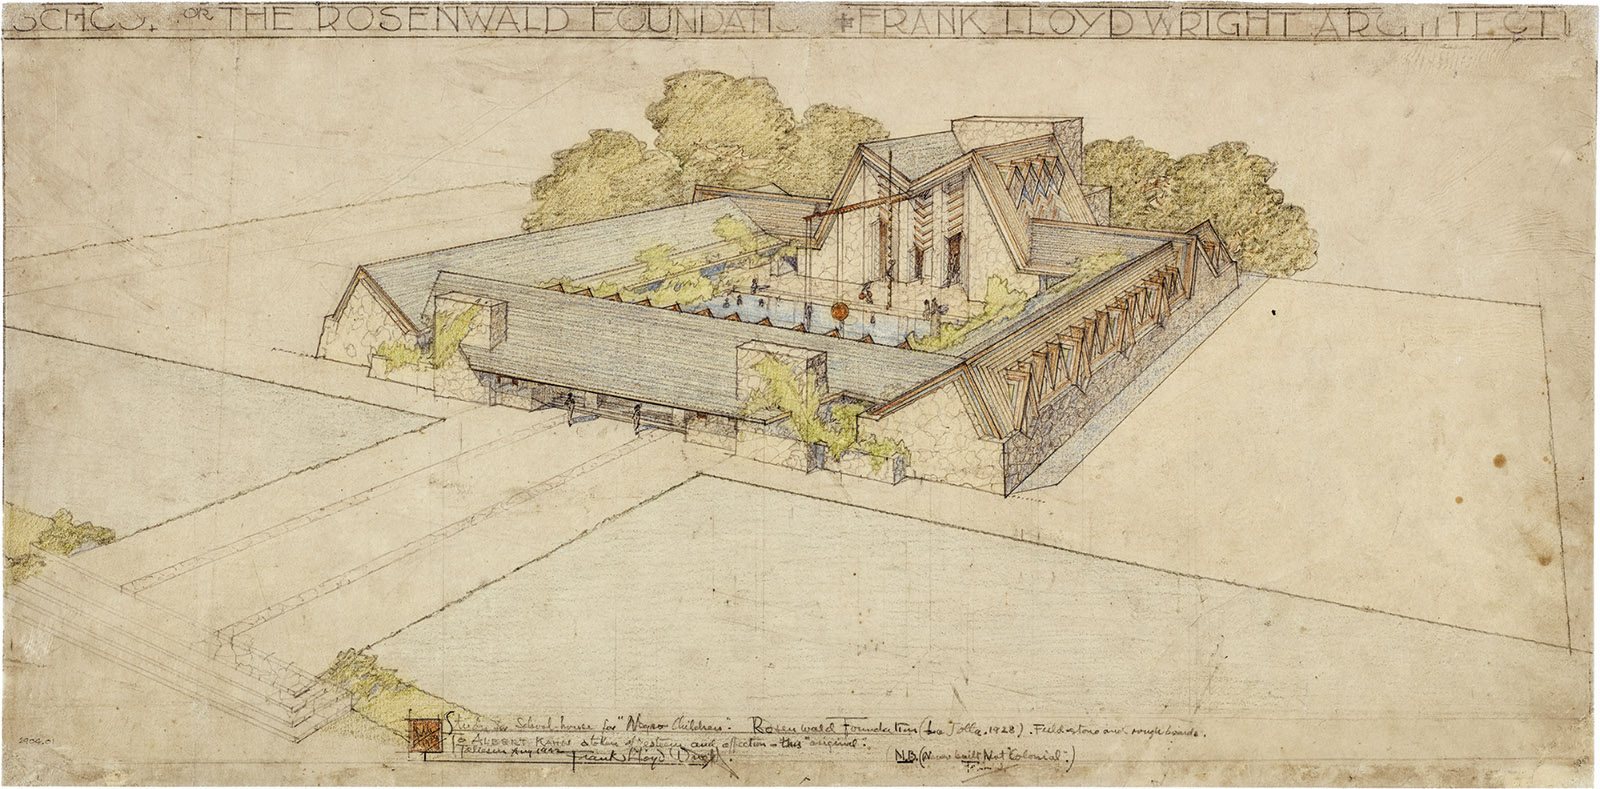 Frank Lloyd Wright Blueprints Guggenheim